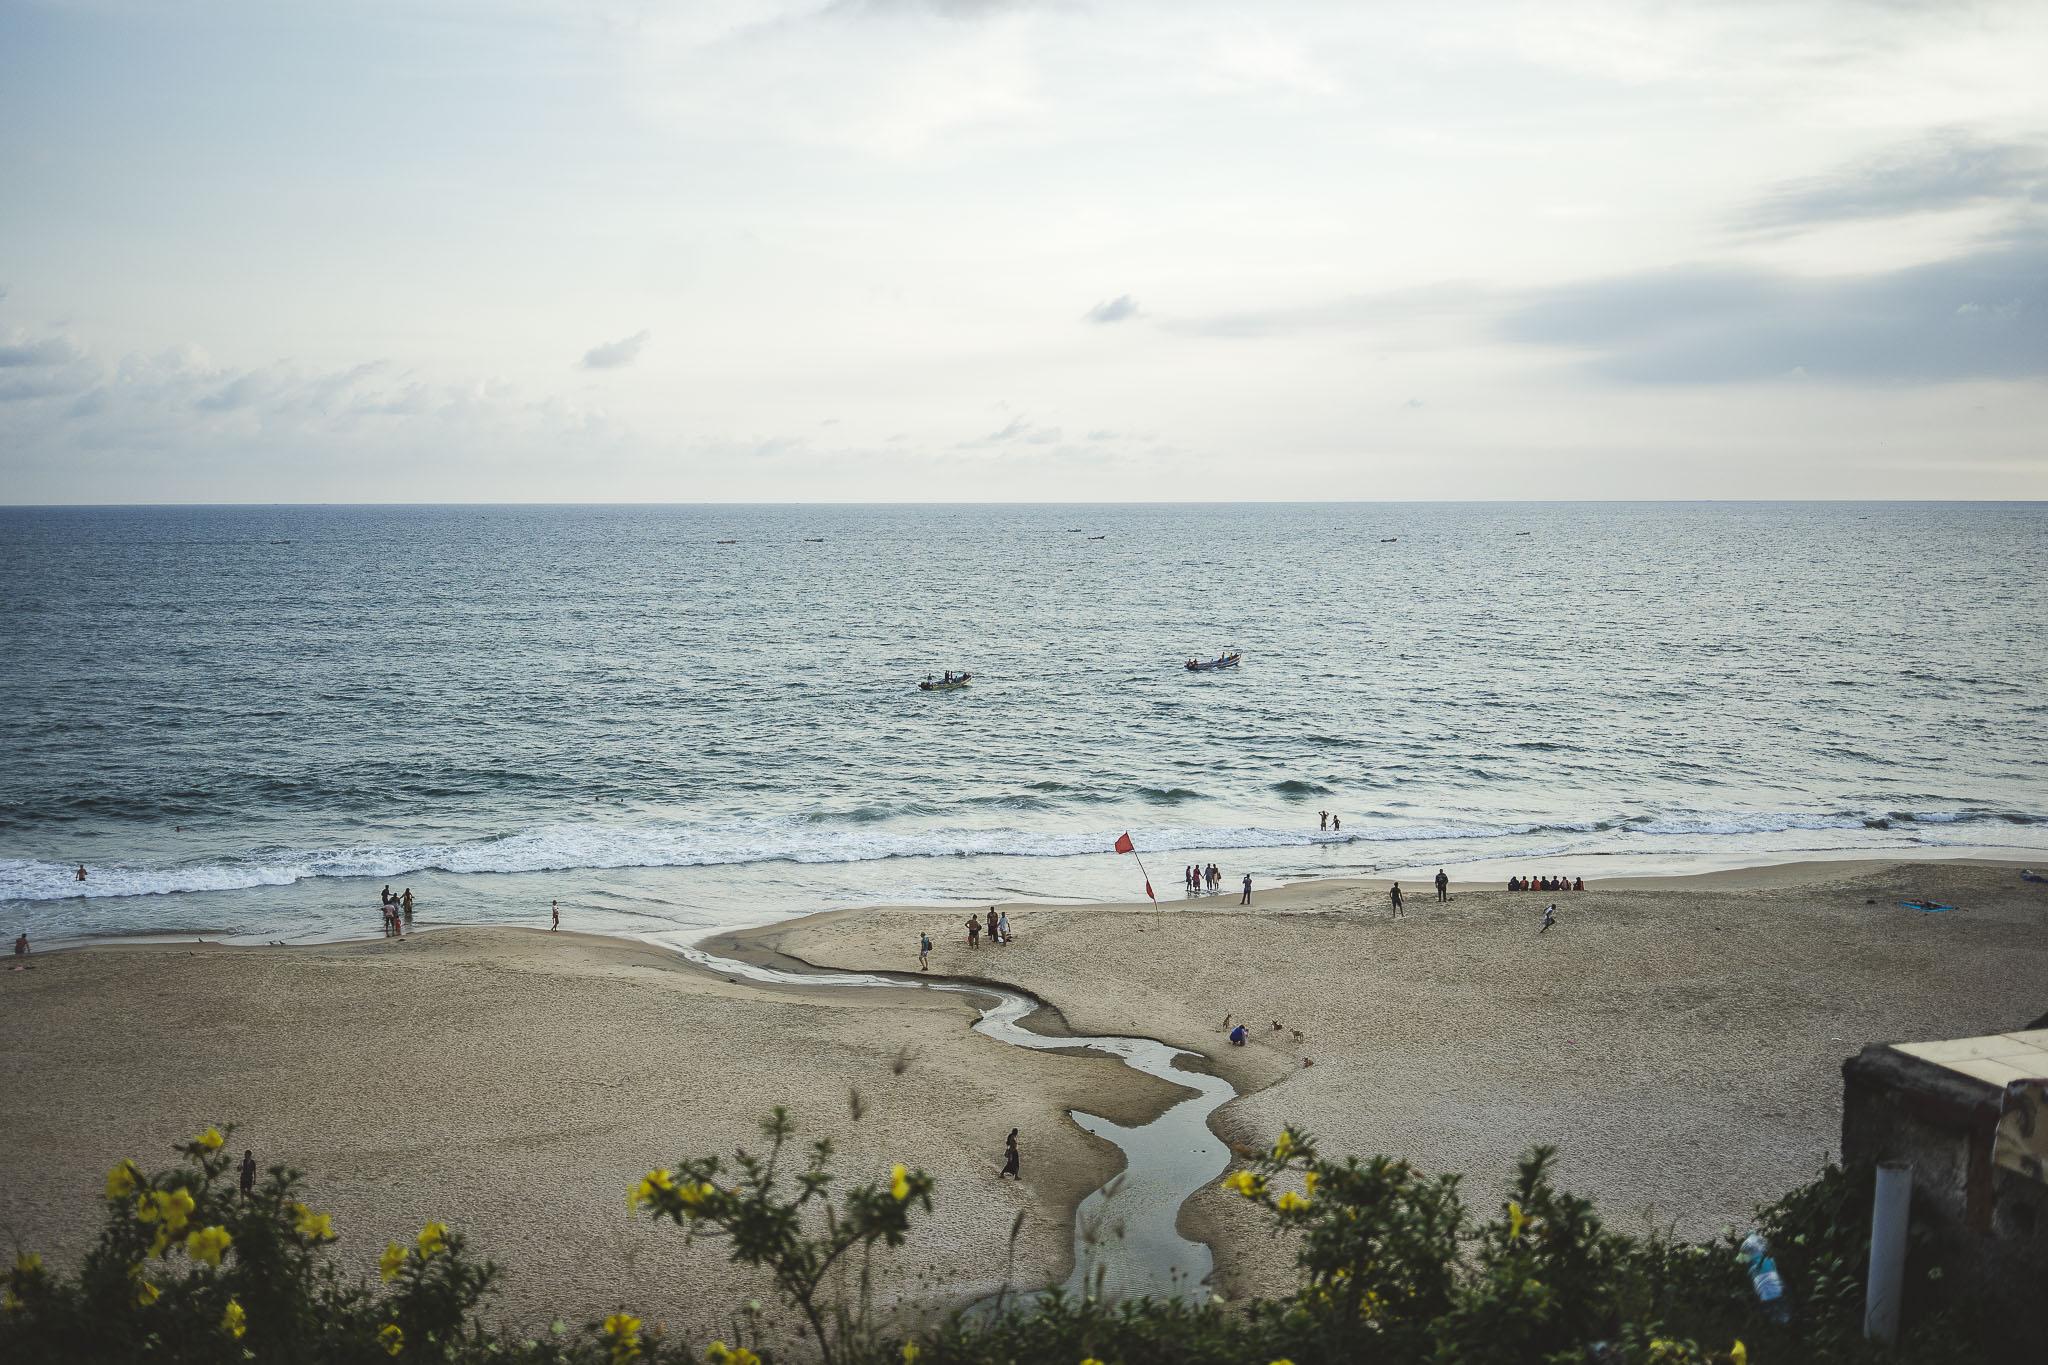 plaża w Varkali, Kerala, Indie